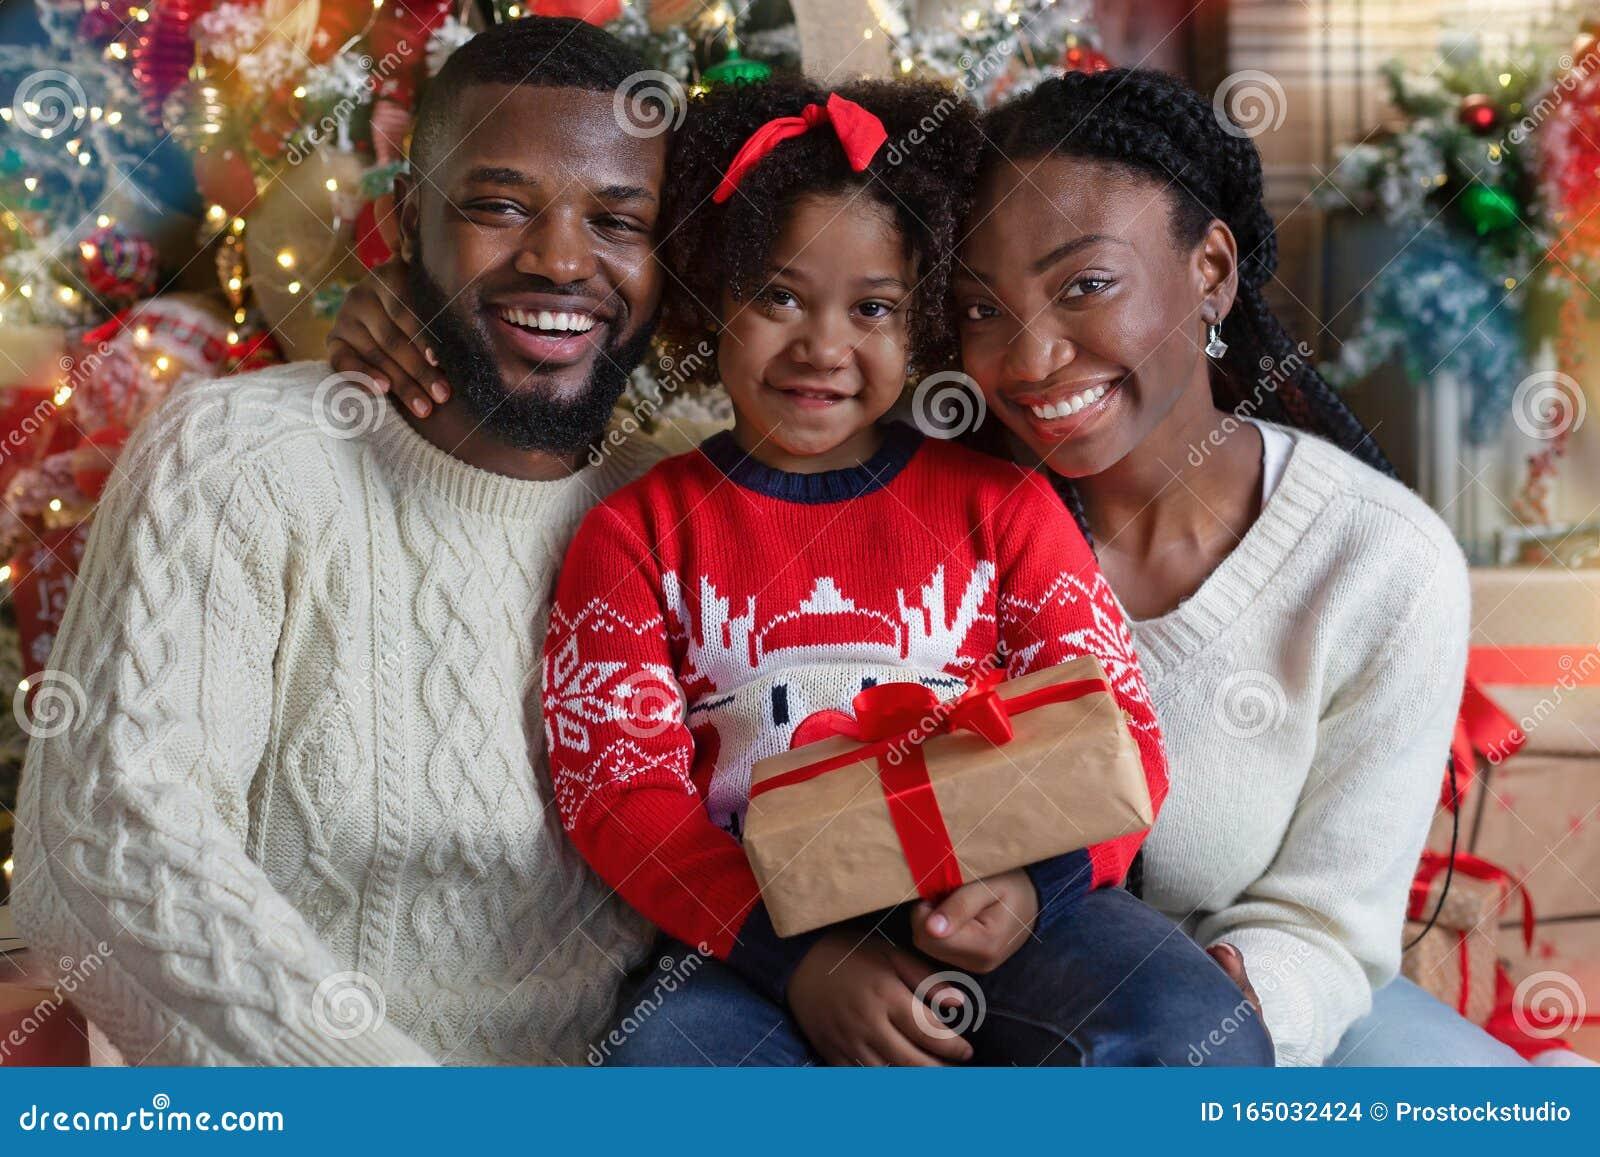 Joyful Black Family Of Three Posing With Gift Near ...